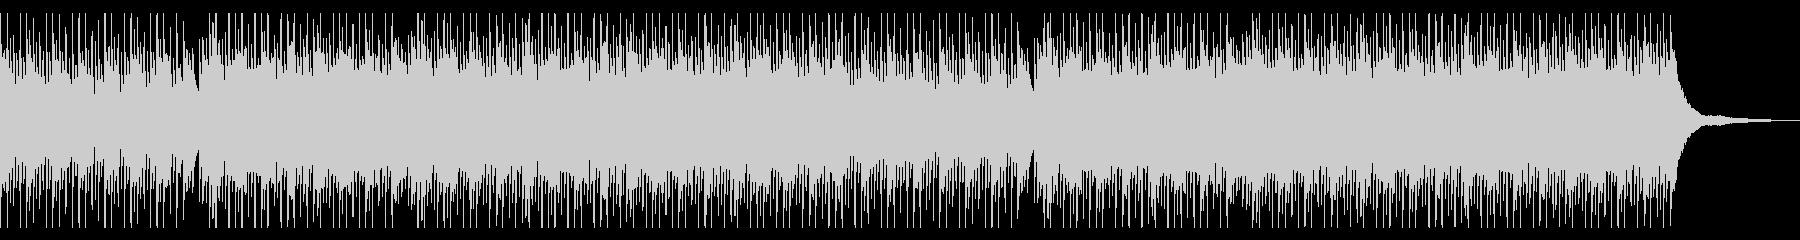 No strings Piano Spark Exhilarating's unreproduced waveform